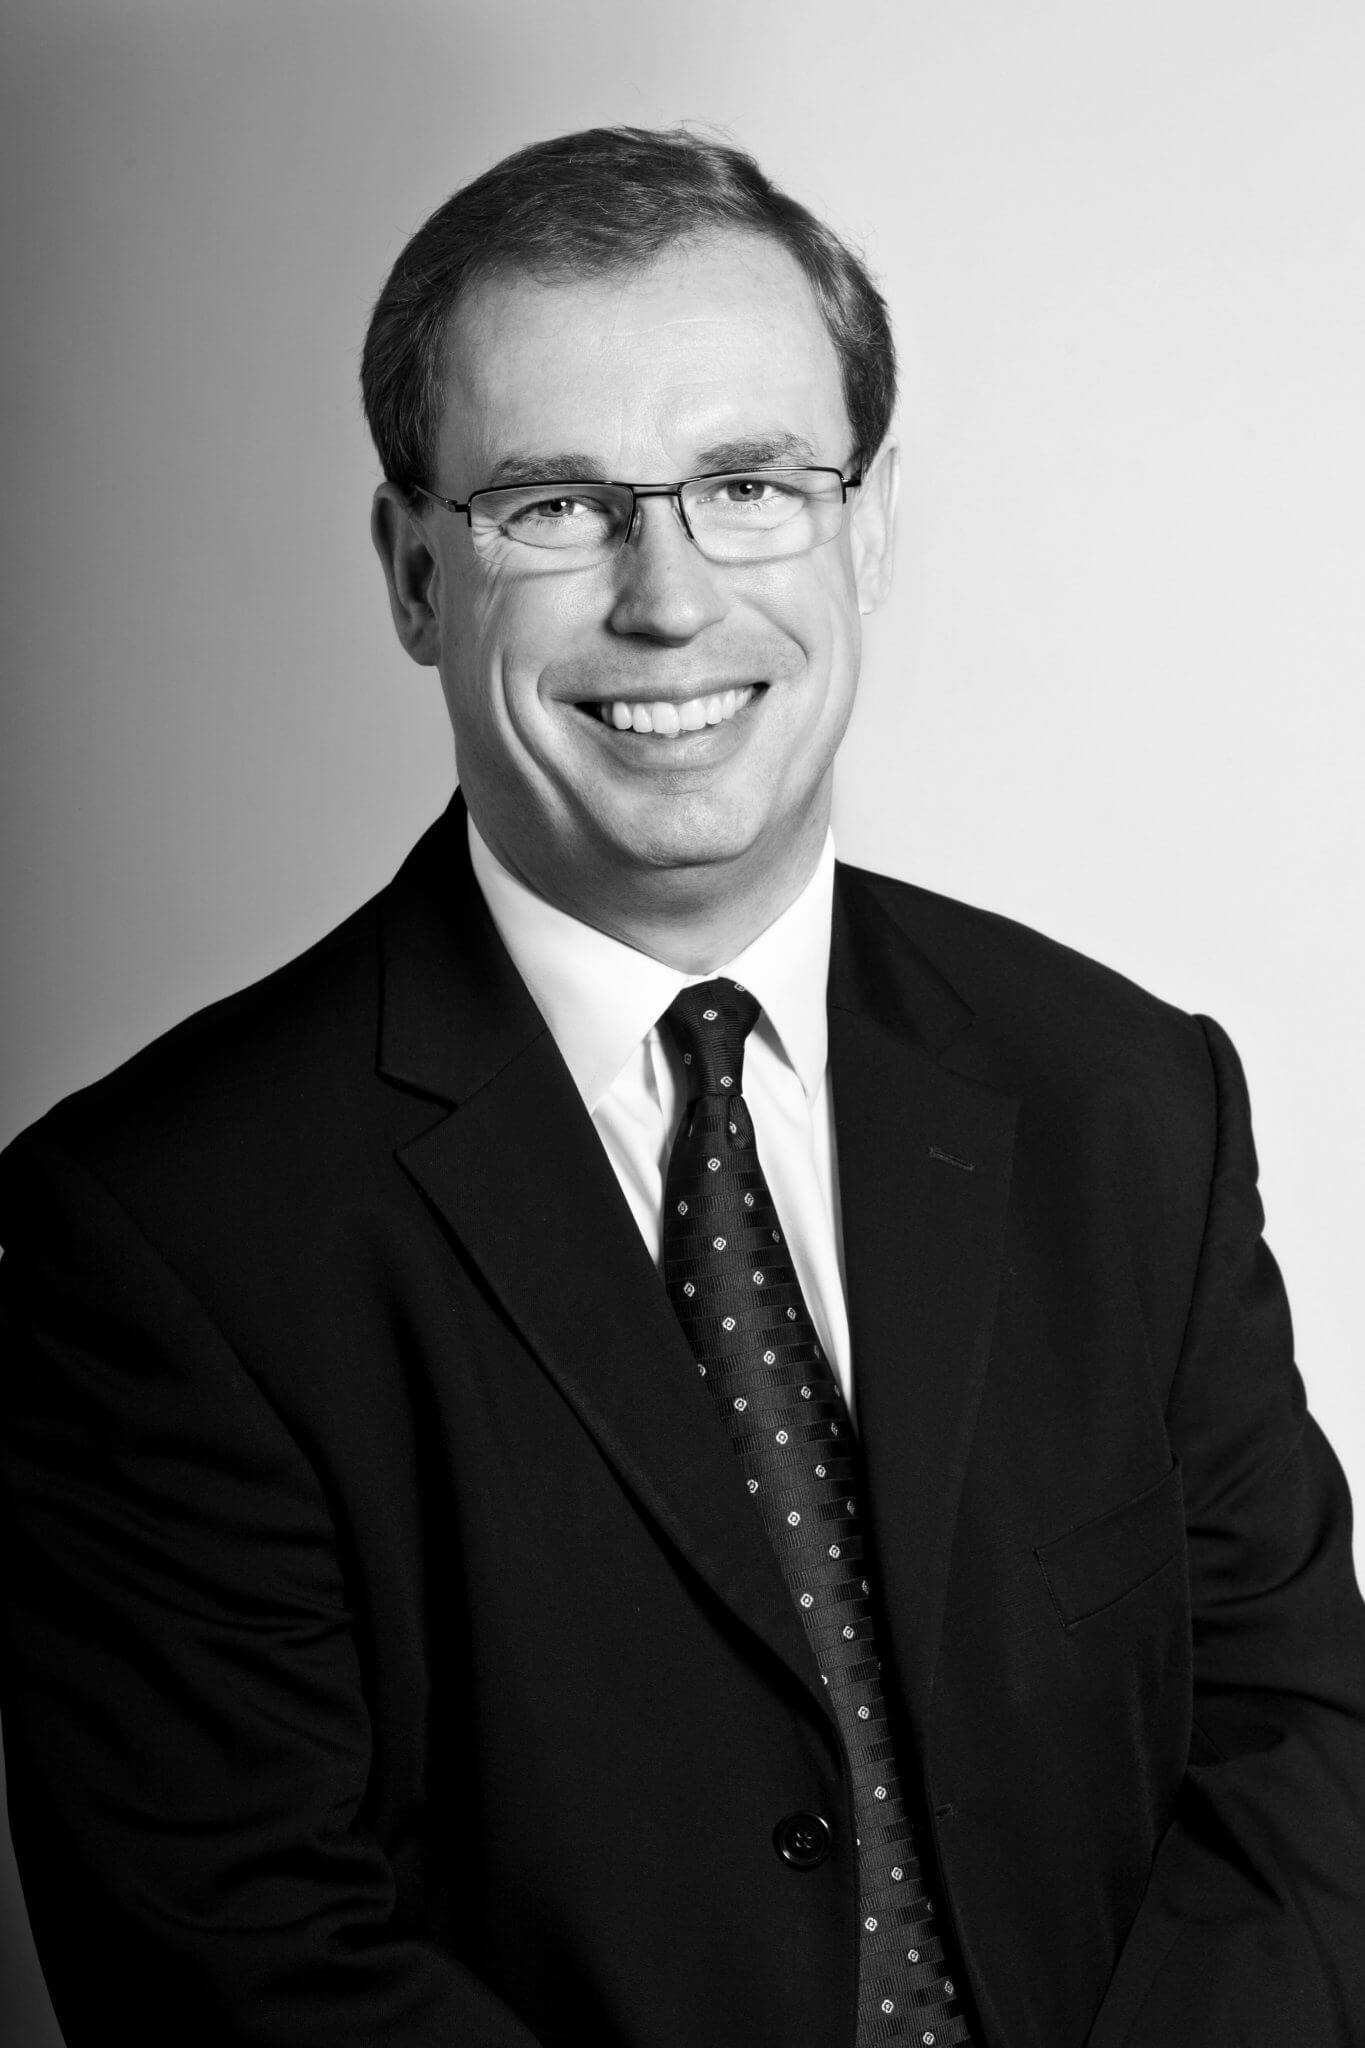 Chelverton Asset Managemnent Appoints Richard Bucknell